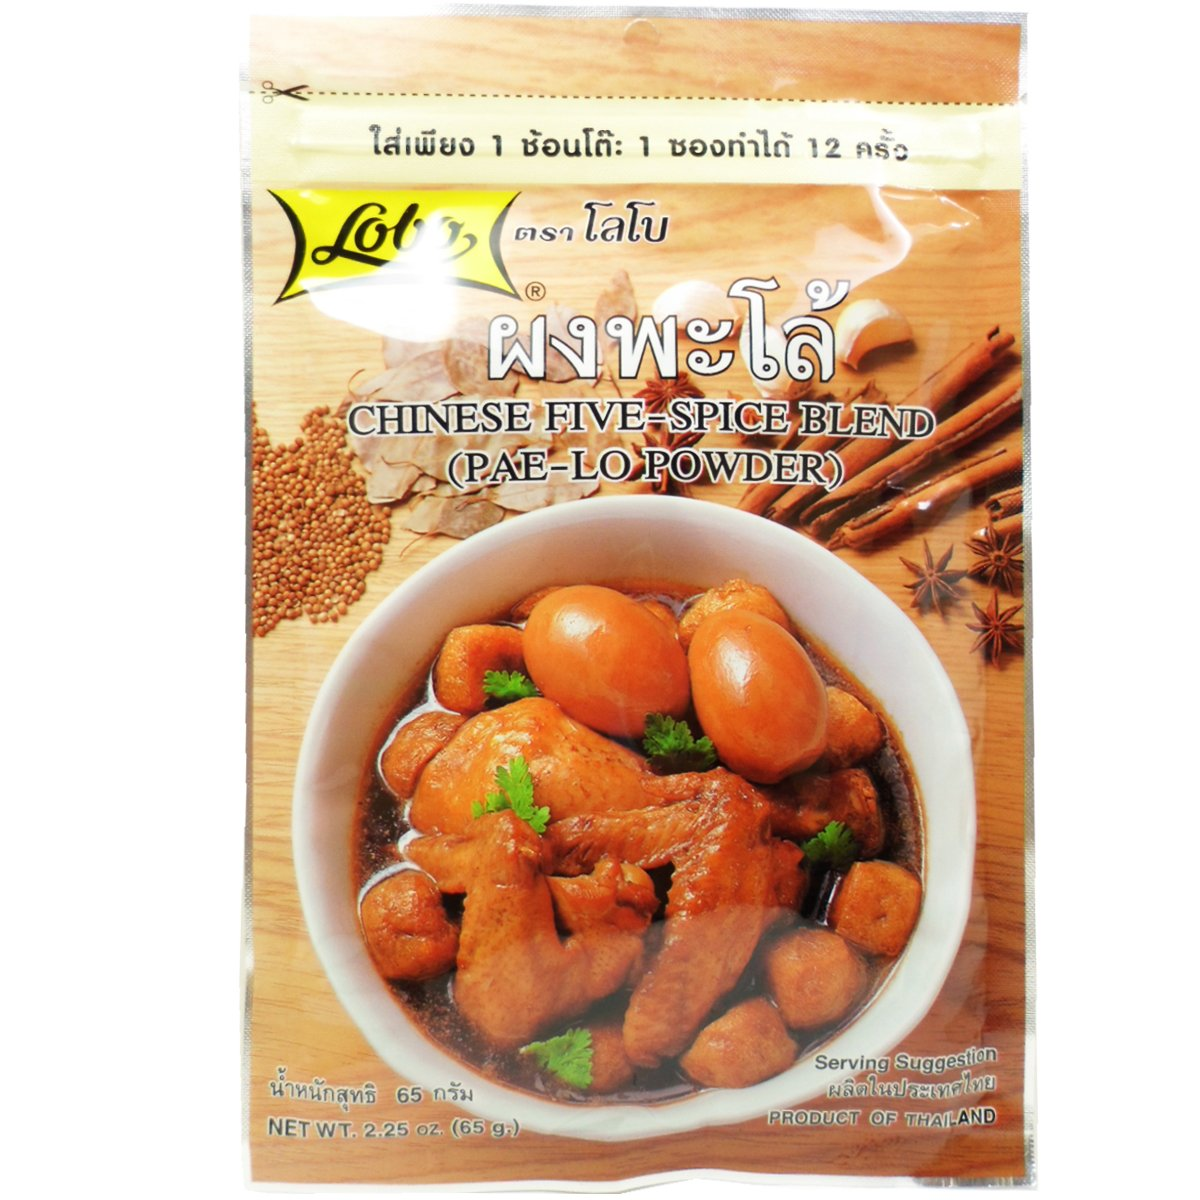 Chinese Five Spice Blend (Pae-lo Powder) Net Wt 65g (2.25 Oz) Thai Herbal Food X 6 Bags